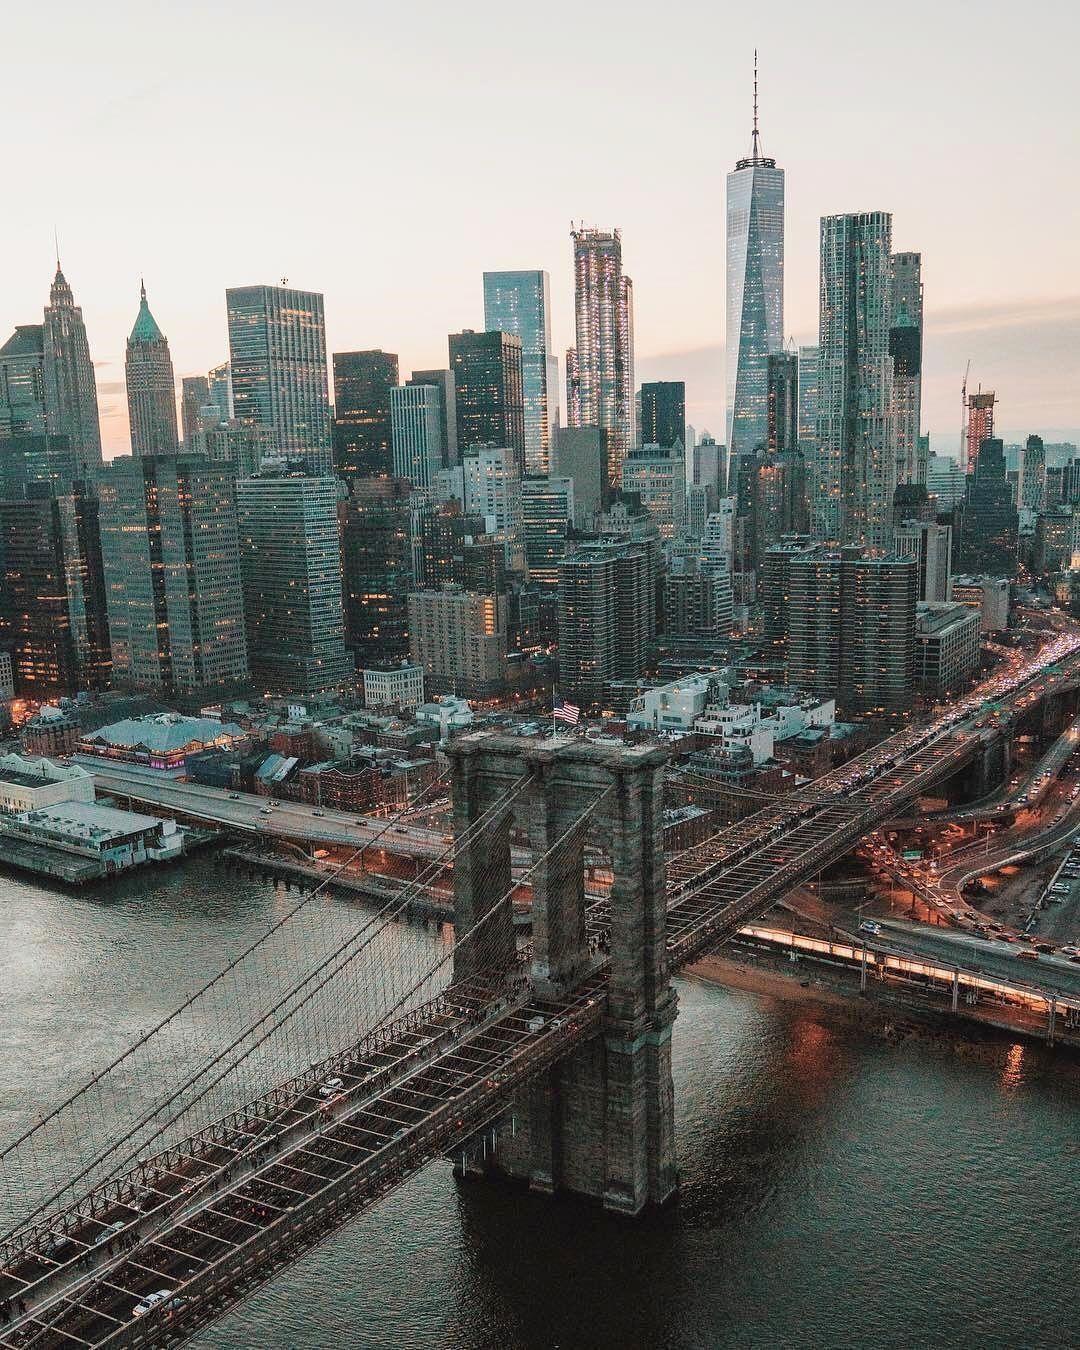 Newyork Newyorkcity Manhattan Oneworldtradecenter Newyorkphotography Photography With Images New York Photos New York City New York